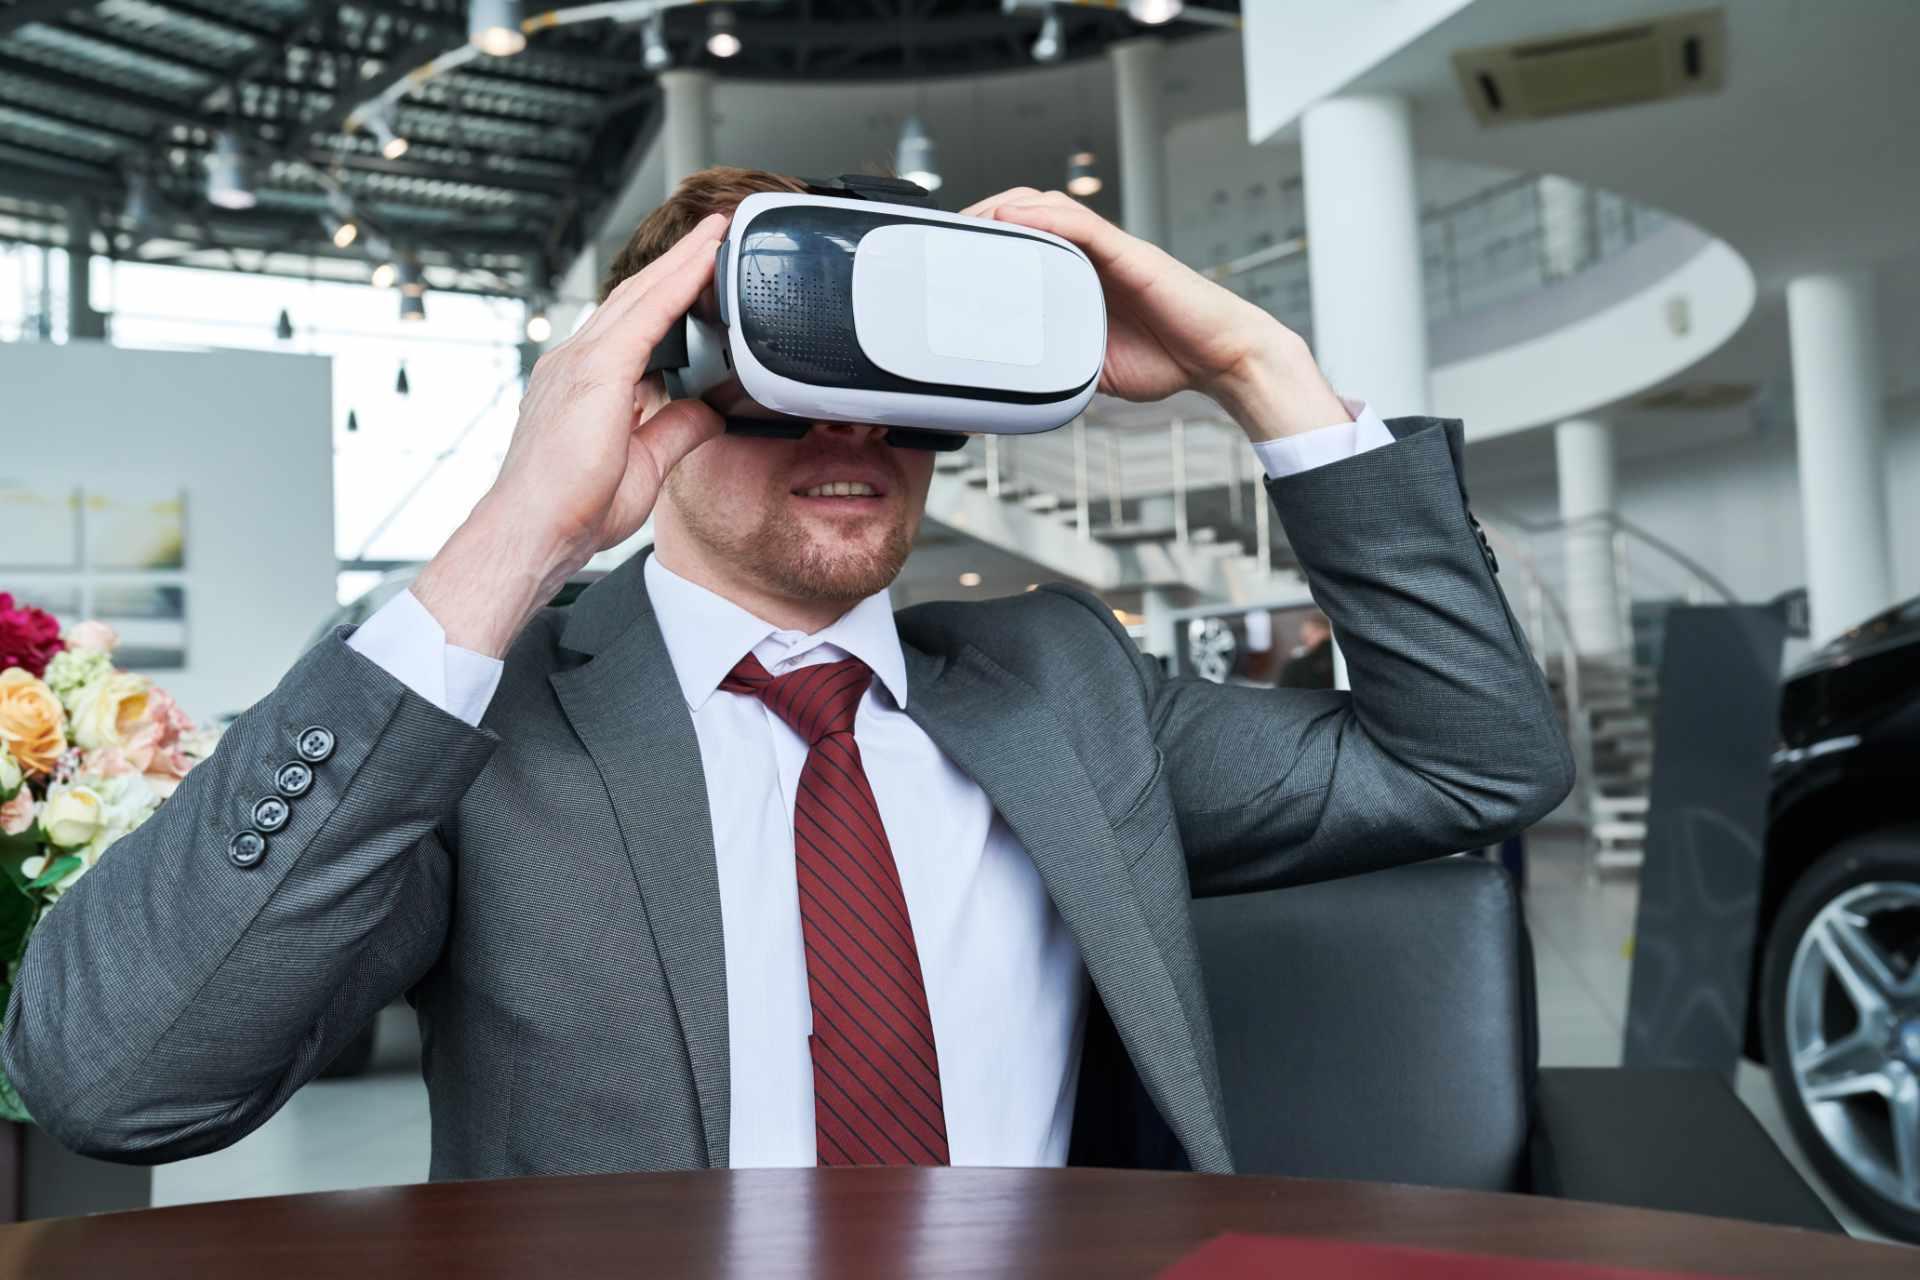 Automotive-news - Guida virtuale e simulatore auto